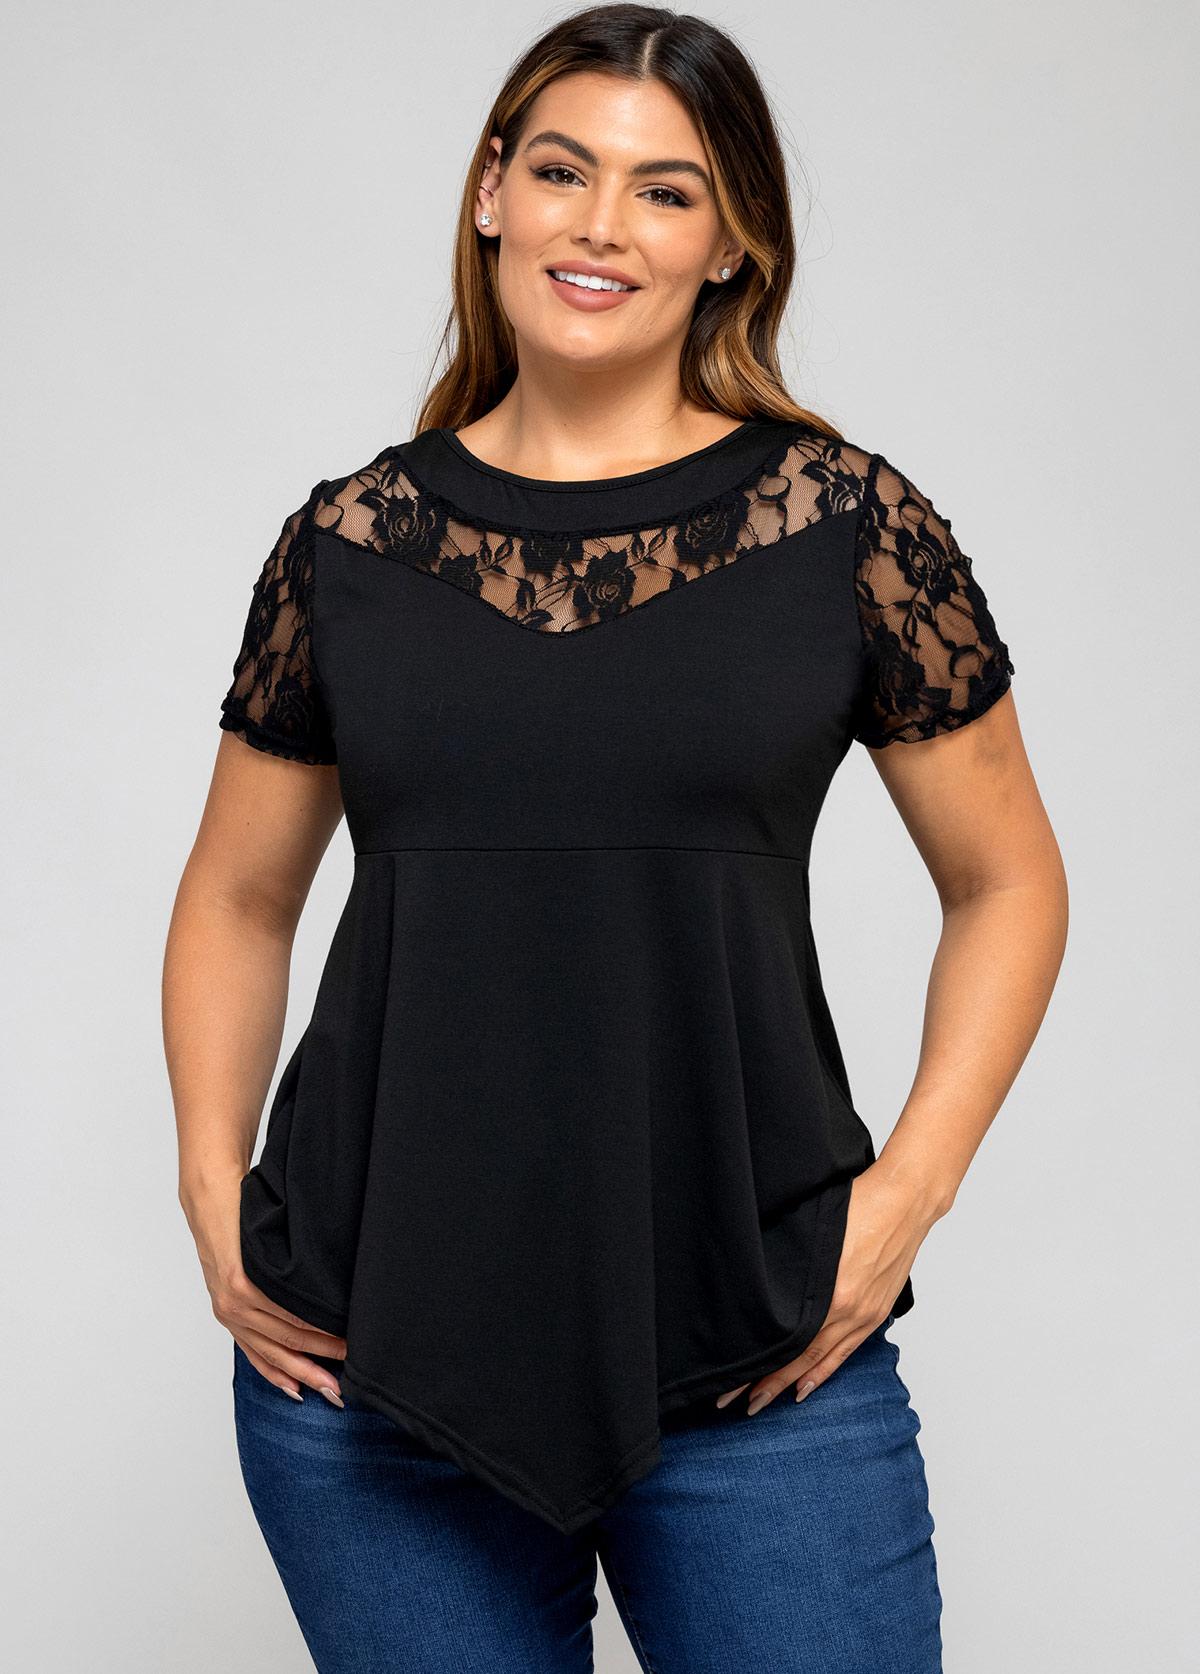 Lace Stitching Asymmetric Hem Plus Size T Shirt